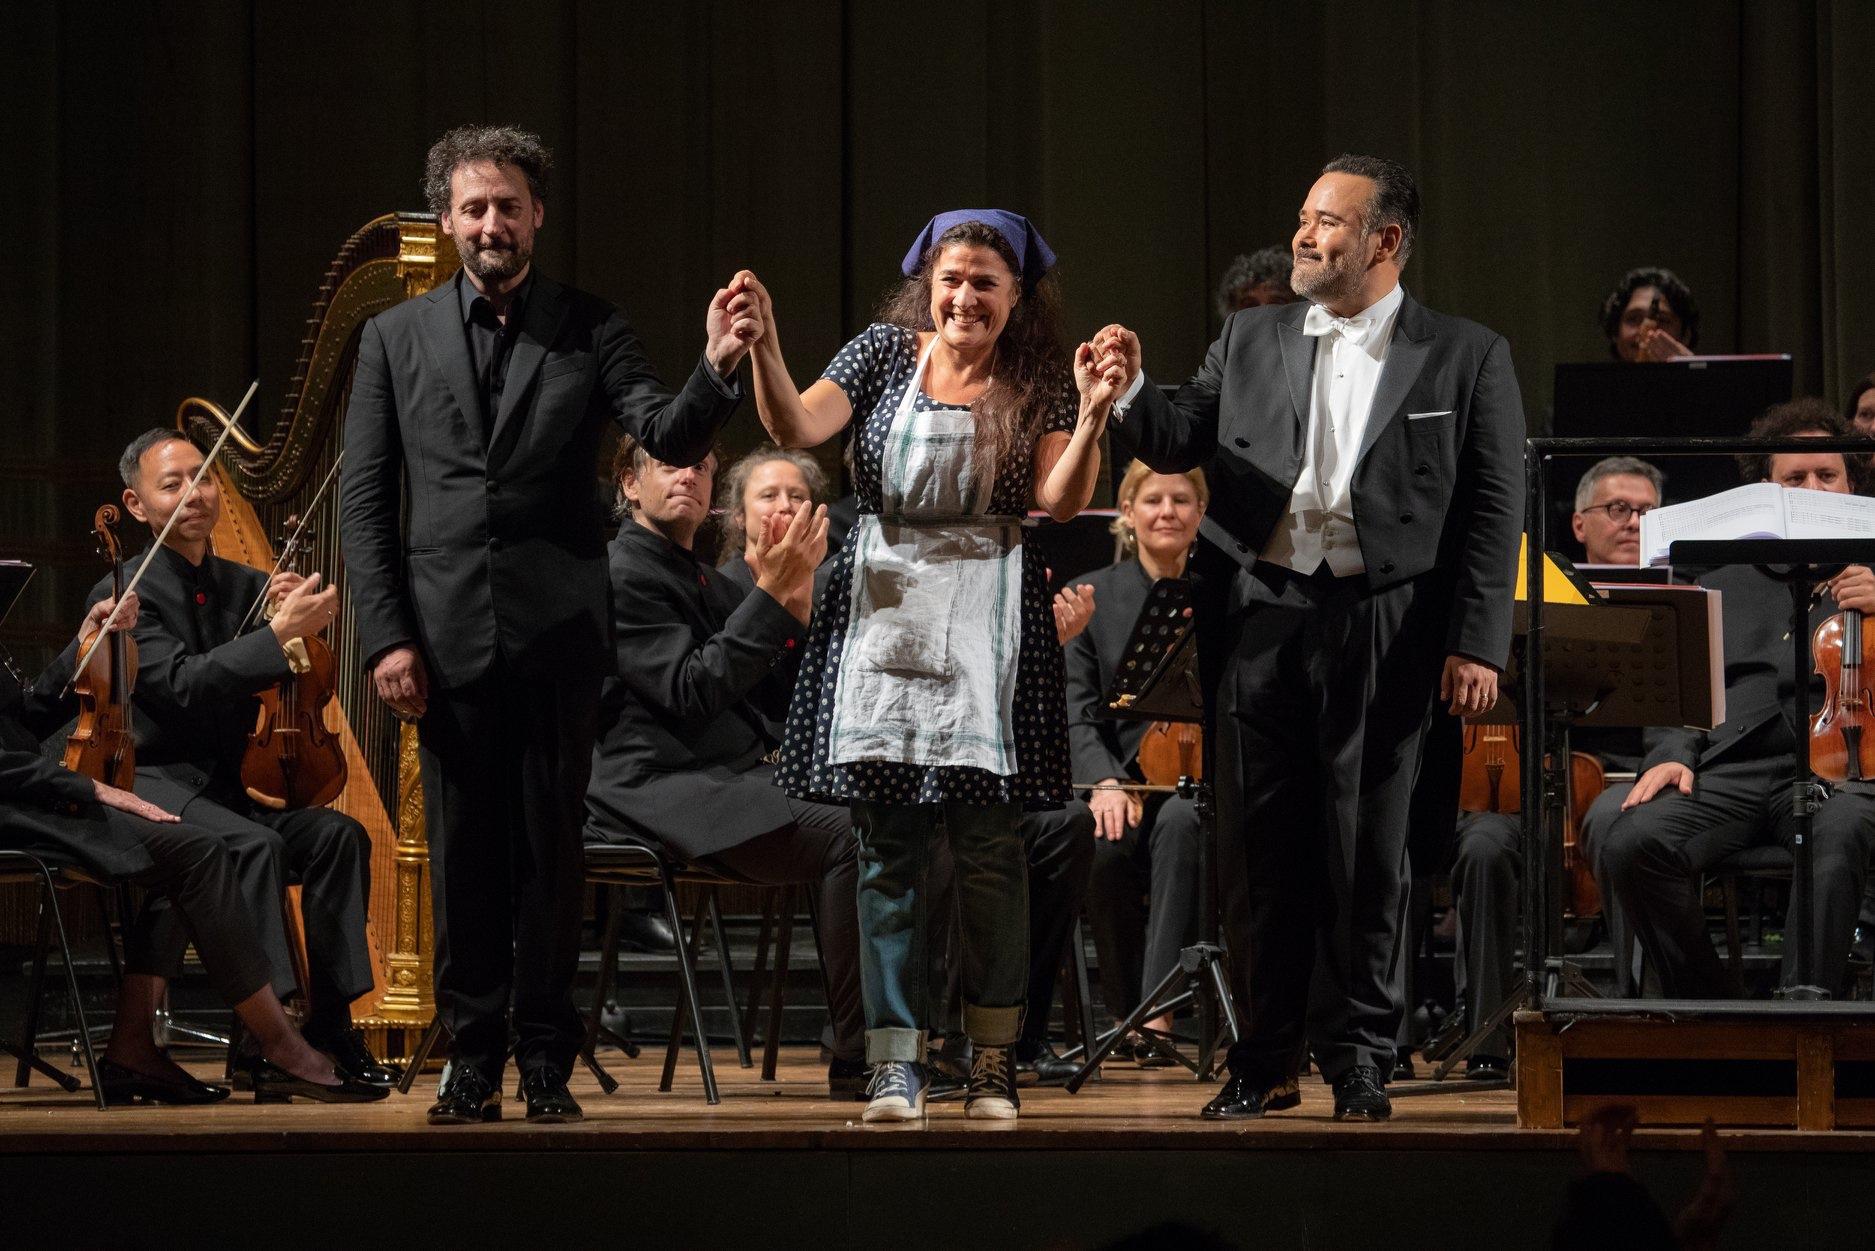 Manuel Garcìa, Gioachino Rossini, Javier Camarena, Gianluca Capuano, Les Musiciens du Prince, Cecilia Bartoli, Teatro Fraschini, Pavia, Festival Musica Sacra, Concerto